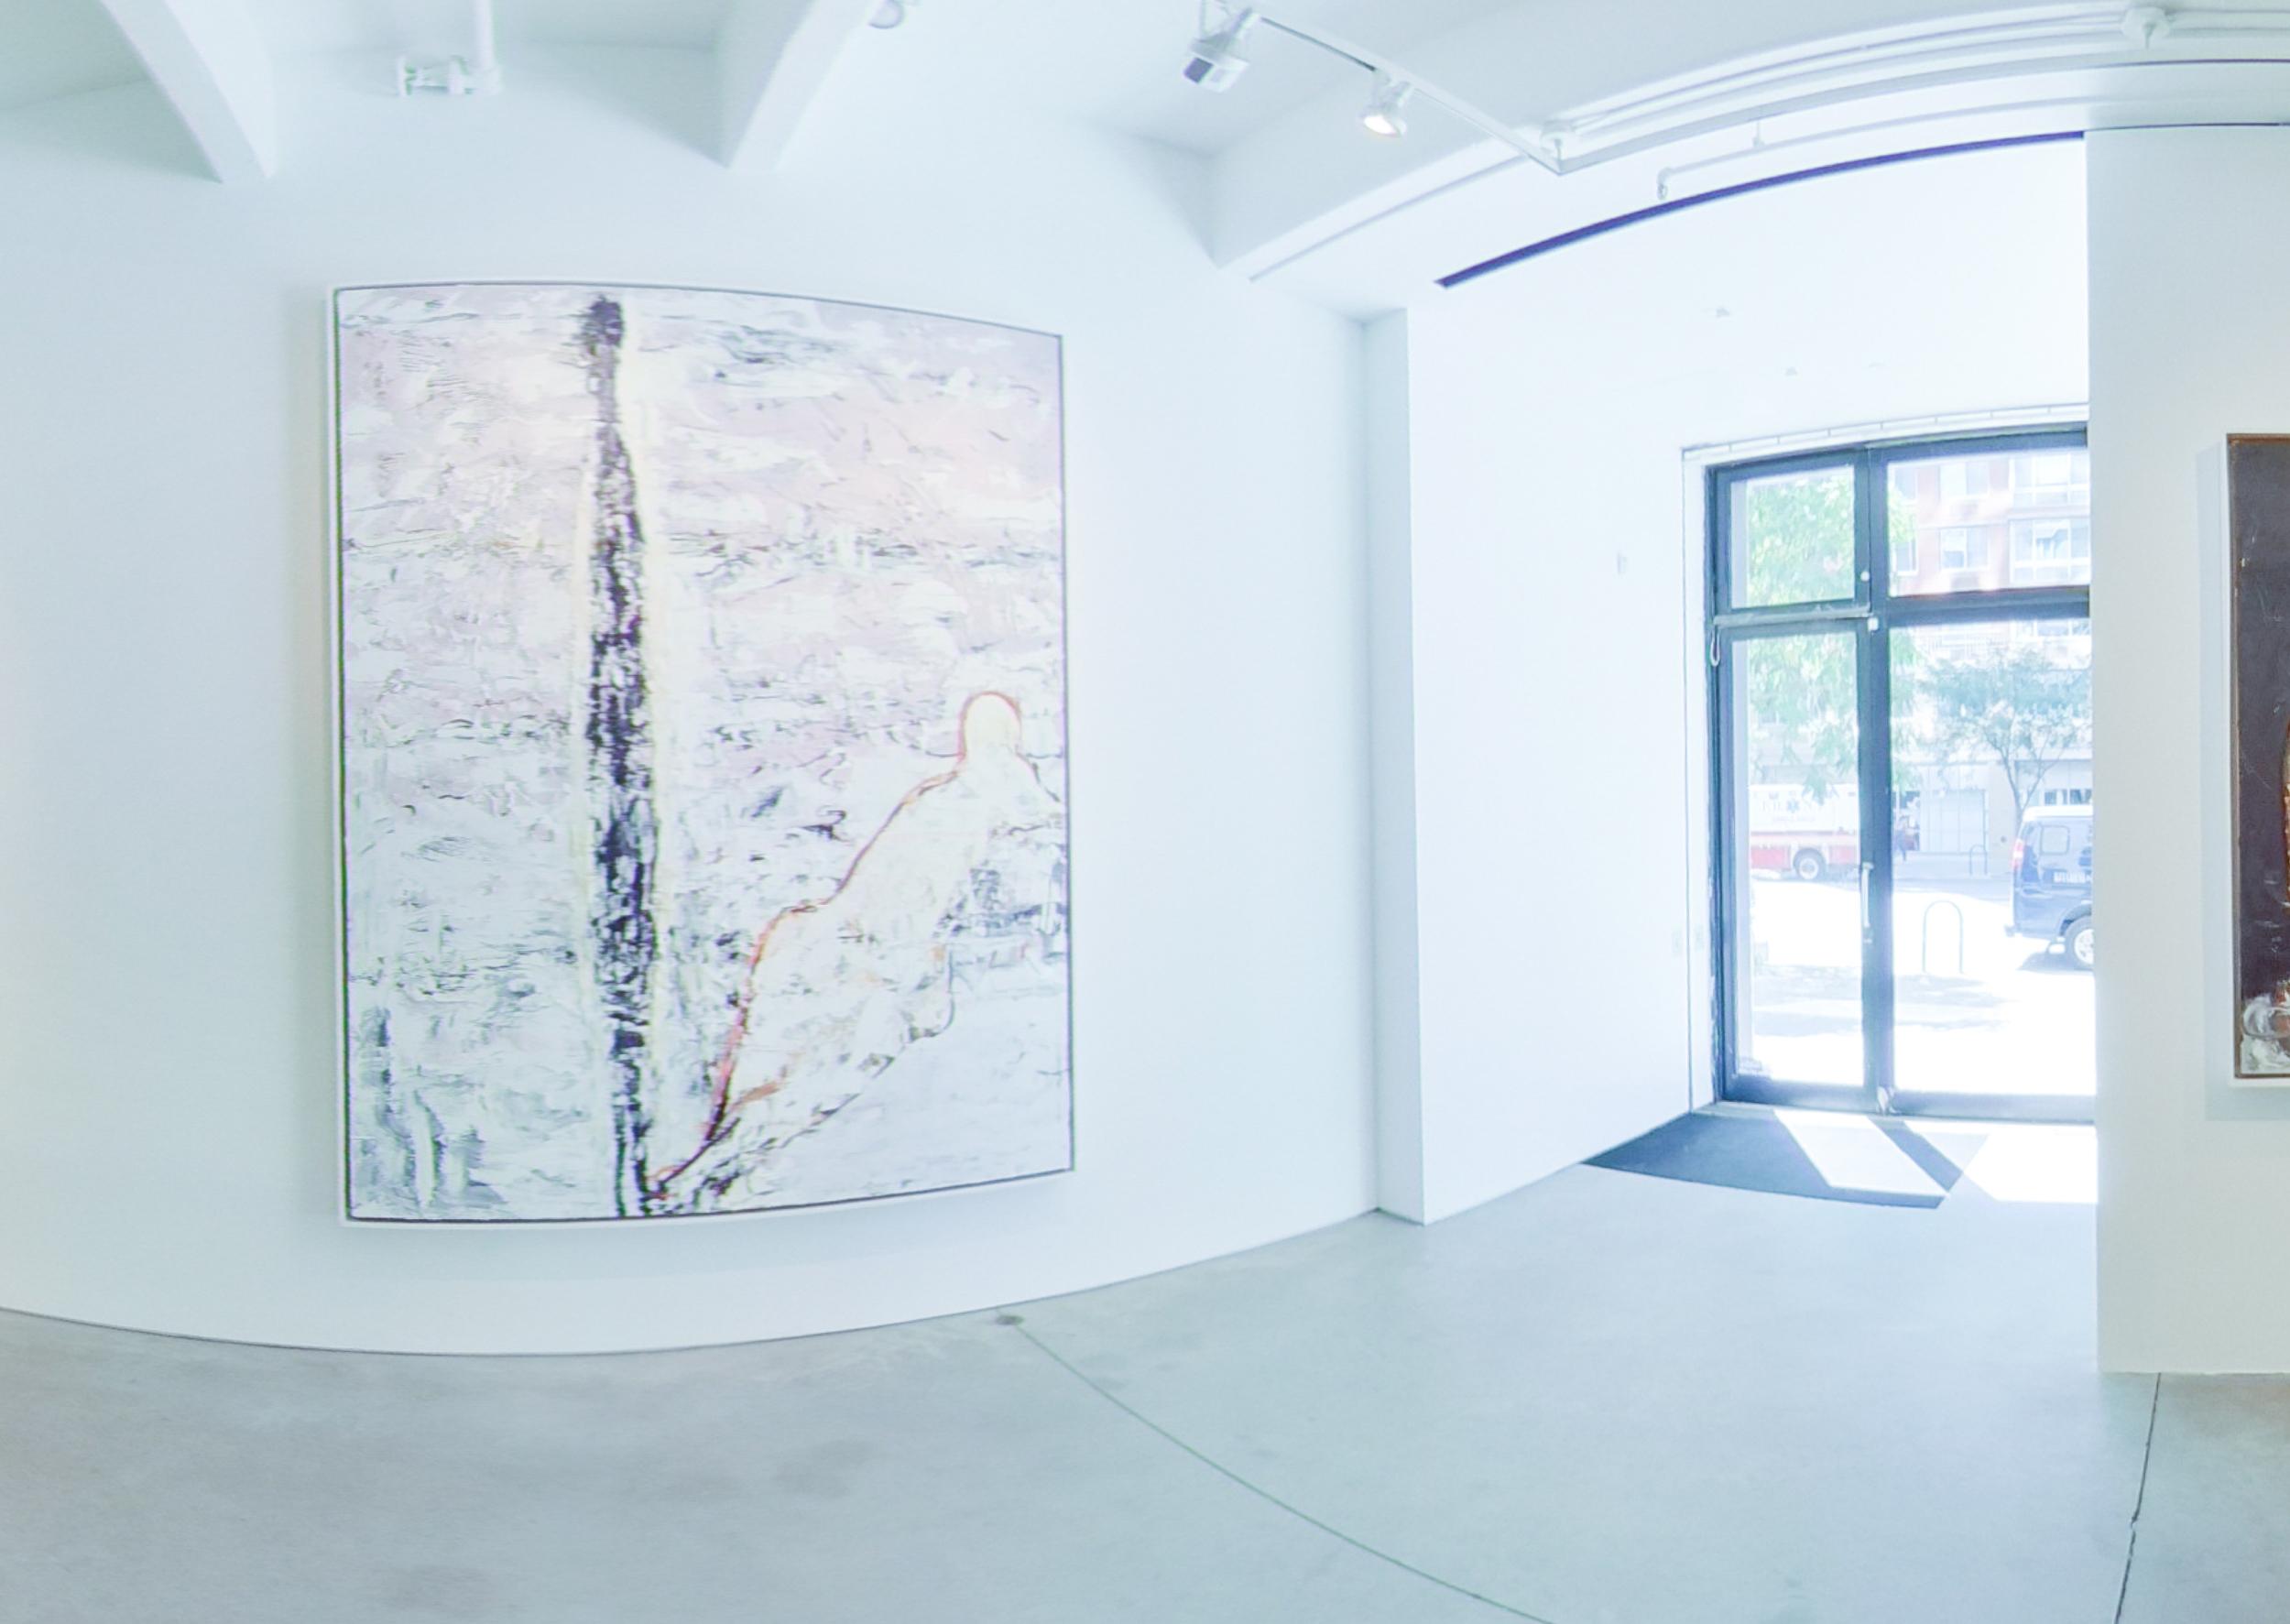 Gallery-Scroll-Liu-Shuishi-03.jpg